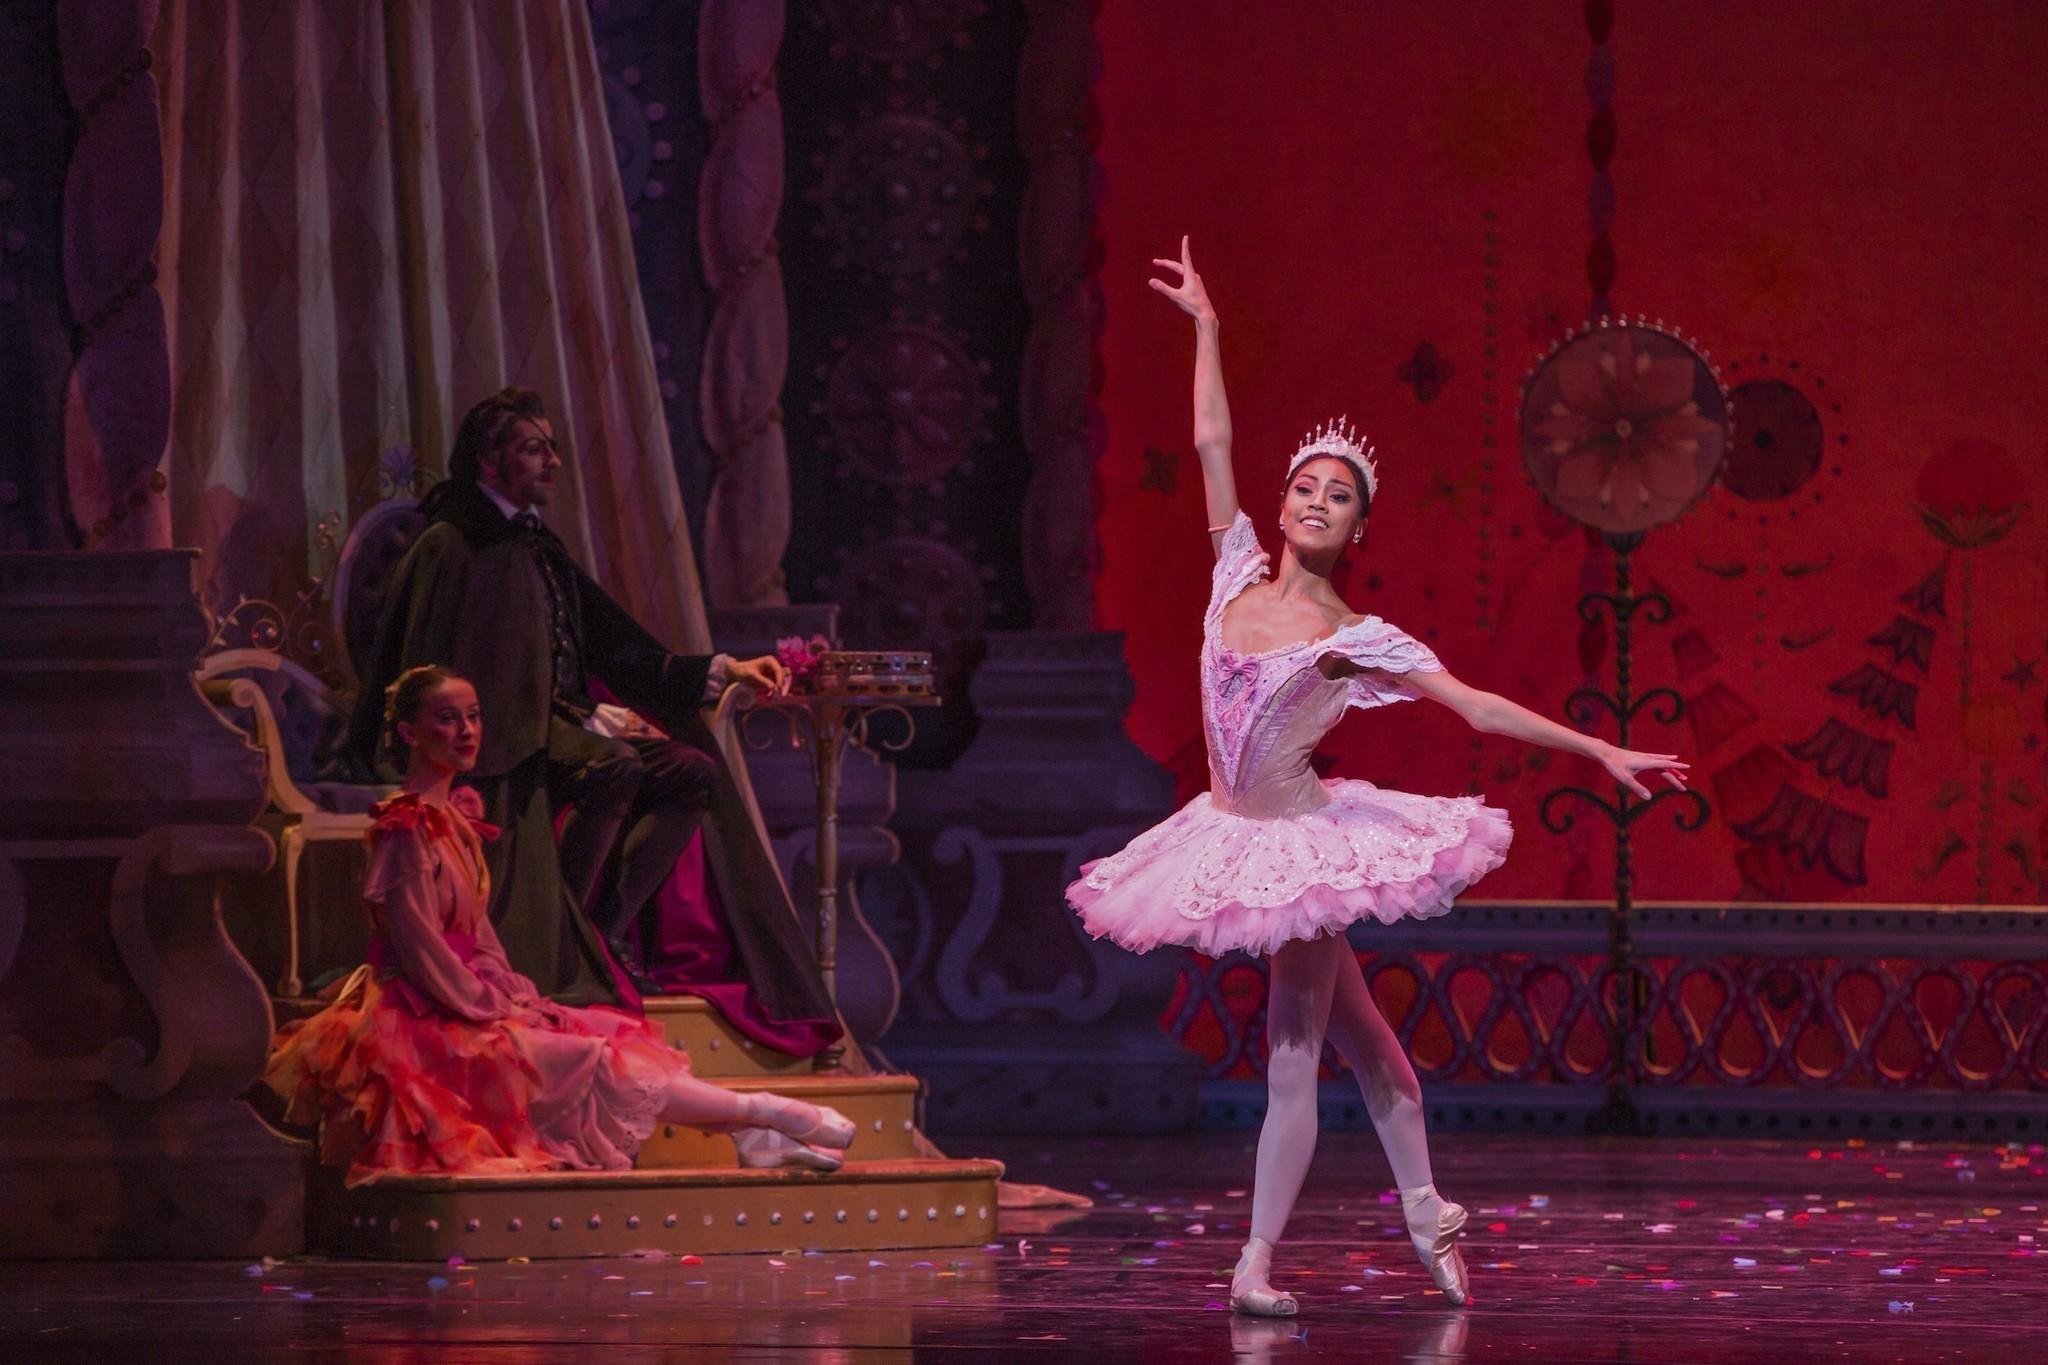 Joffrey ballet nutcracker reviews